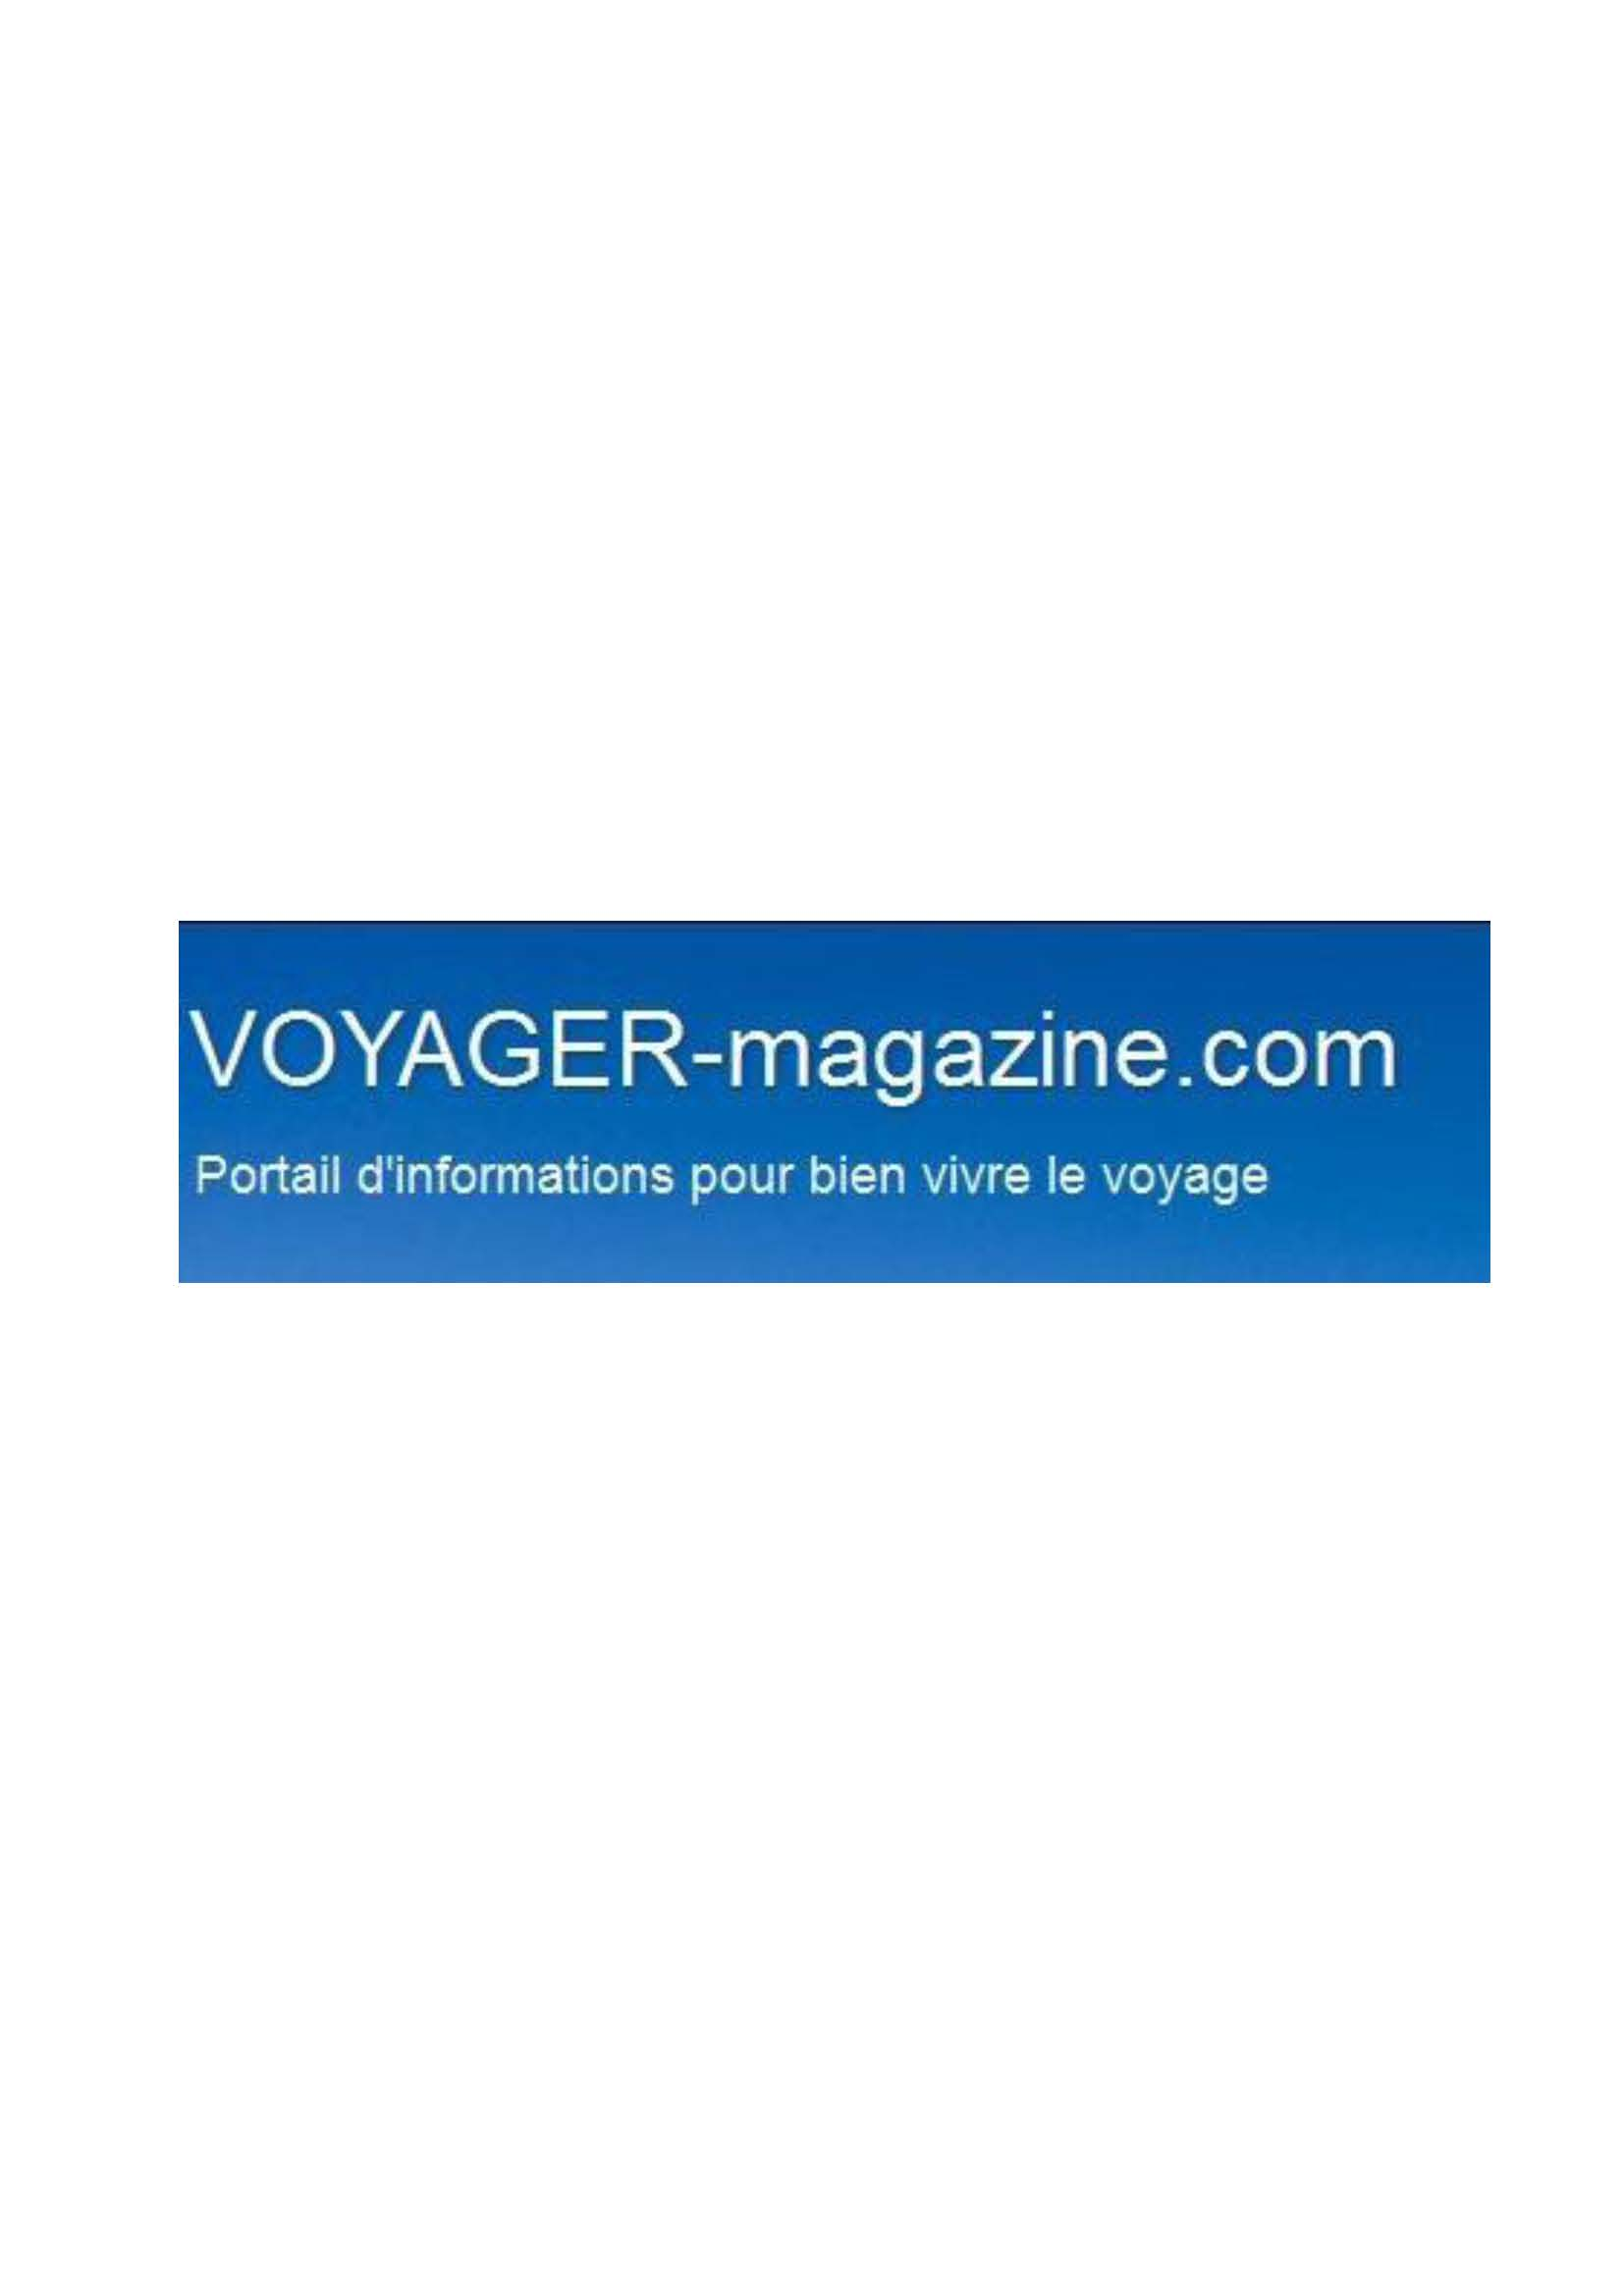 VoyagerMagazine.com